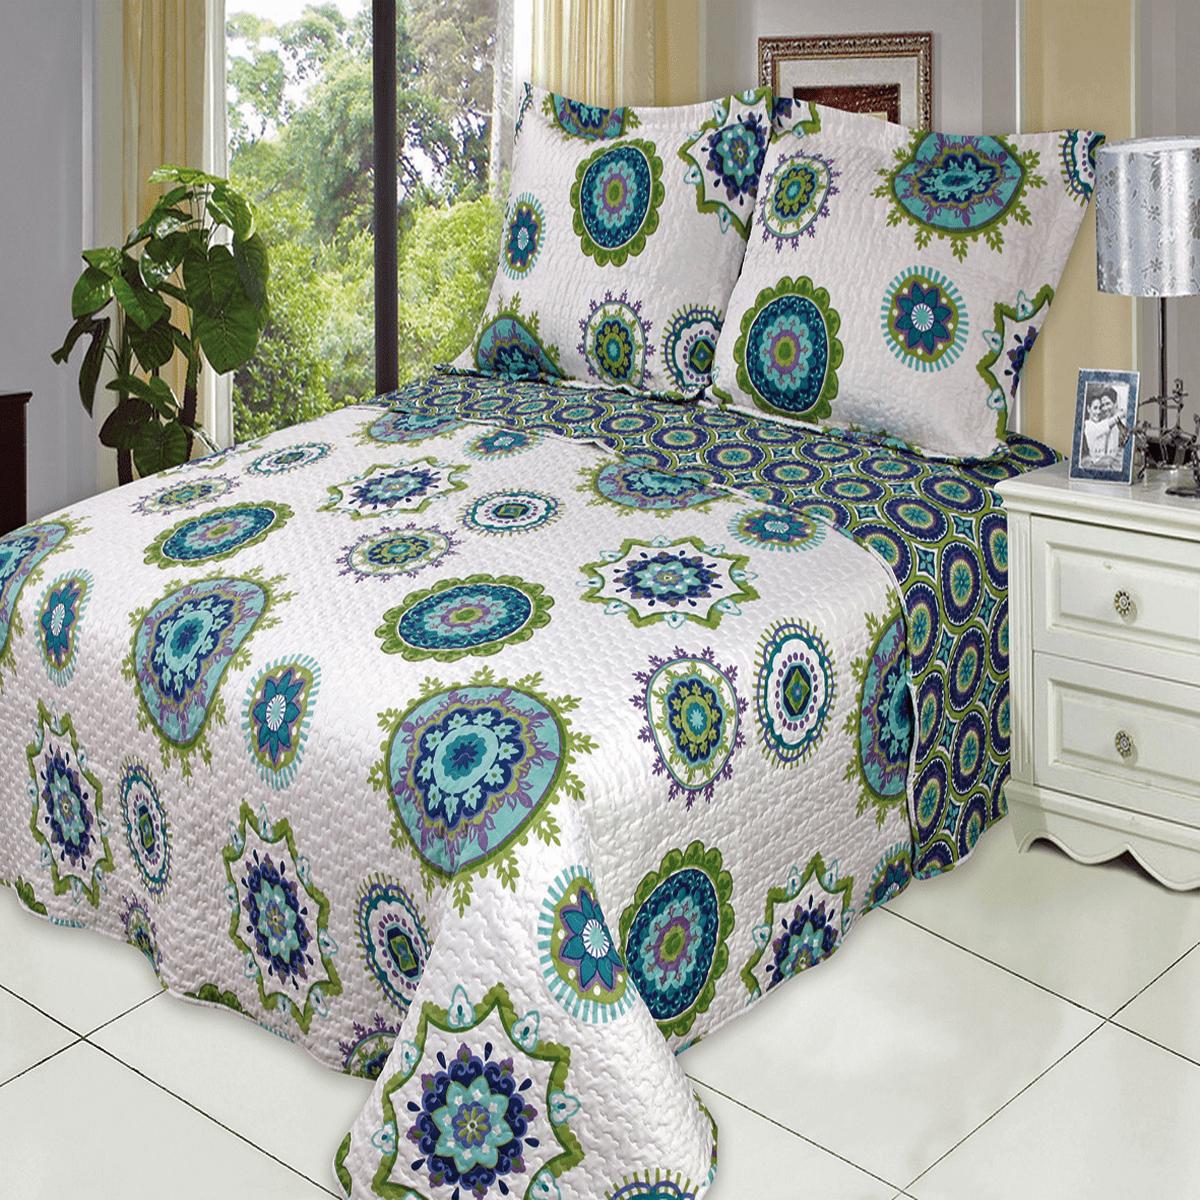 Julia Fashion Floral Design Coverlet Set Oversized Lightweight Reversible Quilt Bedding Set : Full/Queen - Cool